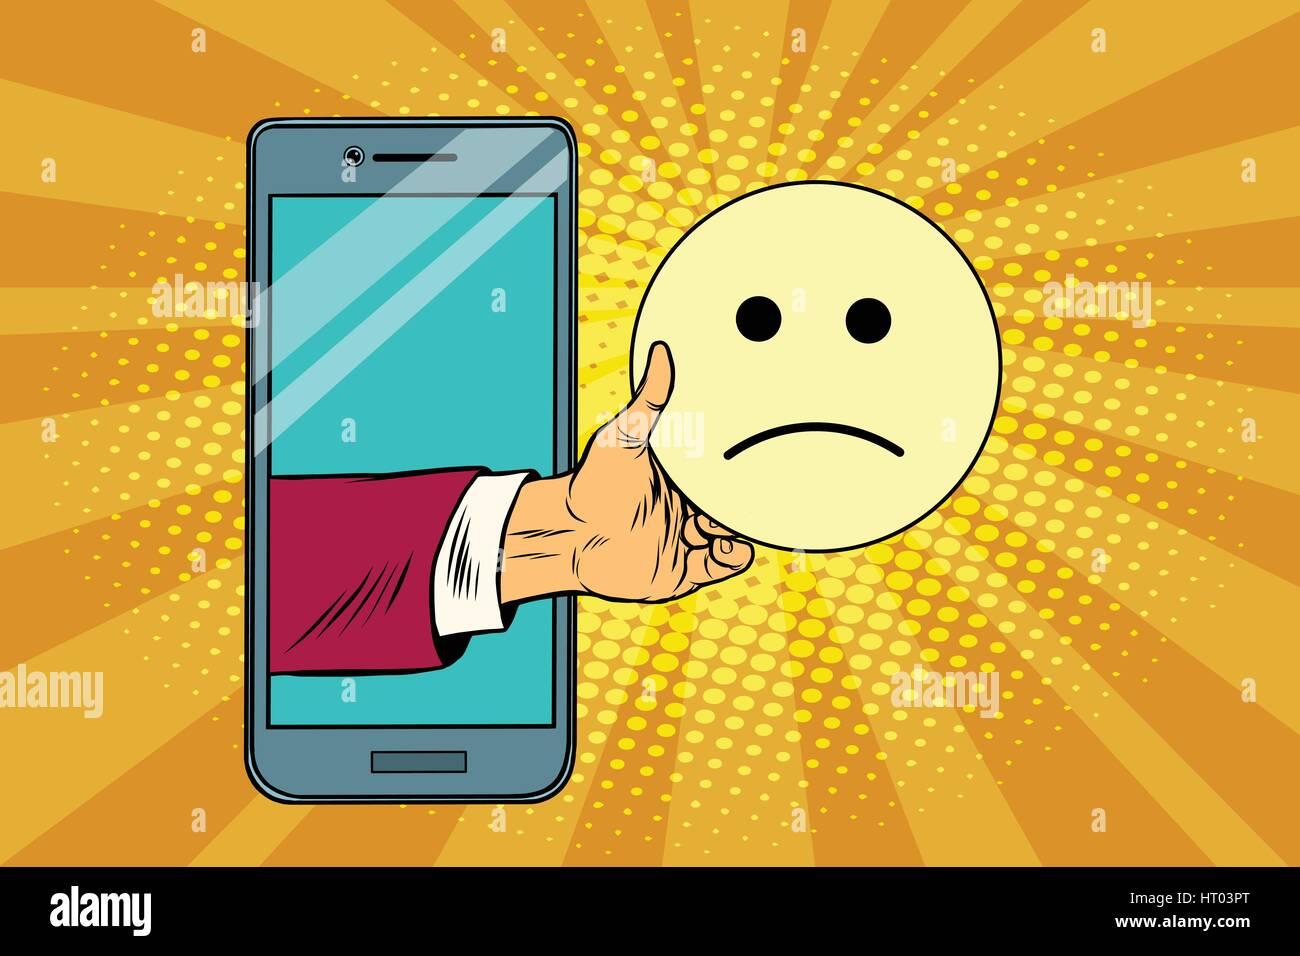 sadness resentment emoji emoticons in smartphone - Stock Image